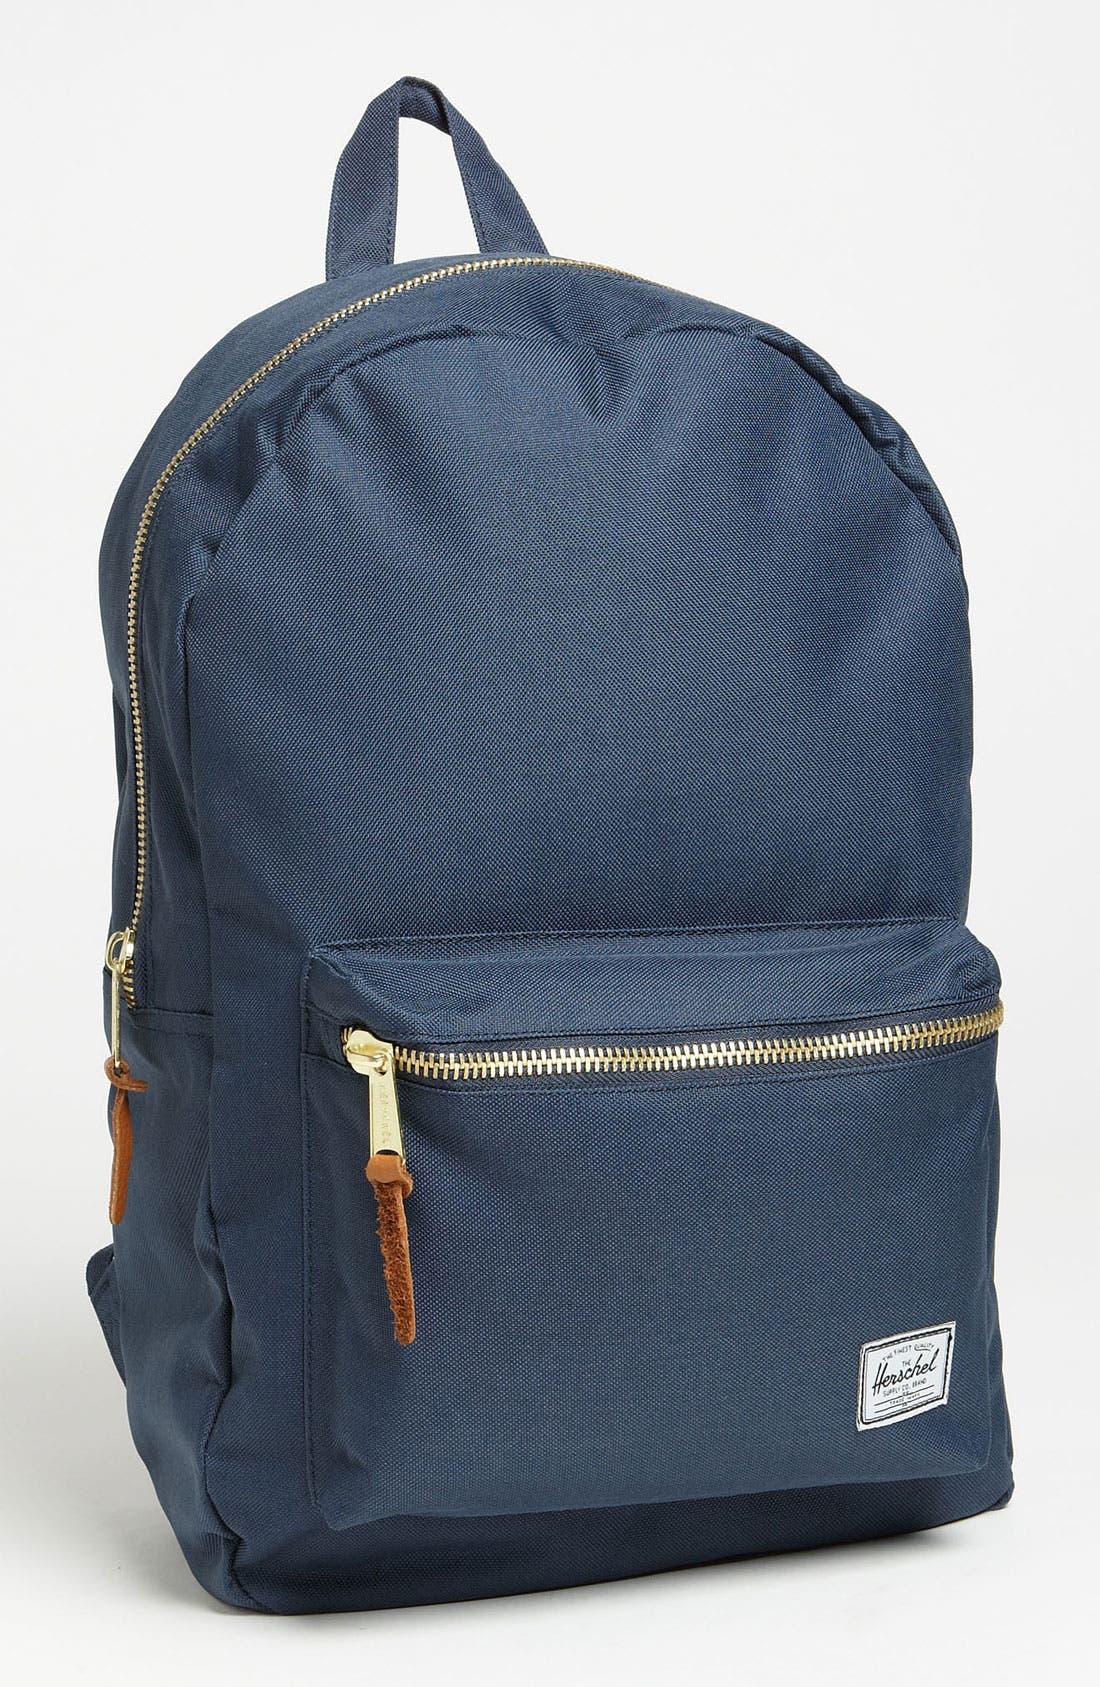 Alternate Image 1 Selected - Herschel Supply Co. 'Settlement' Backpack